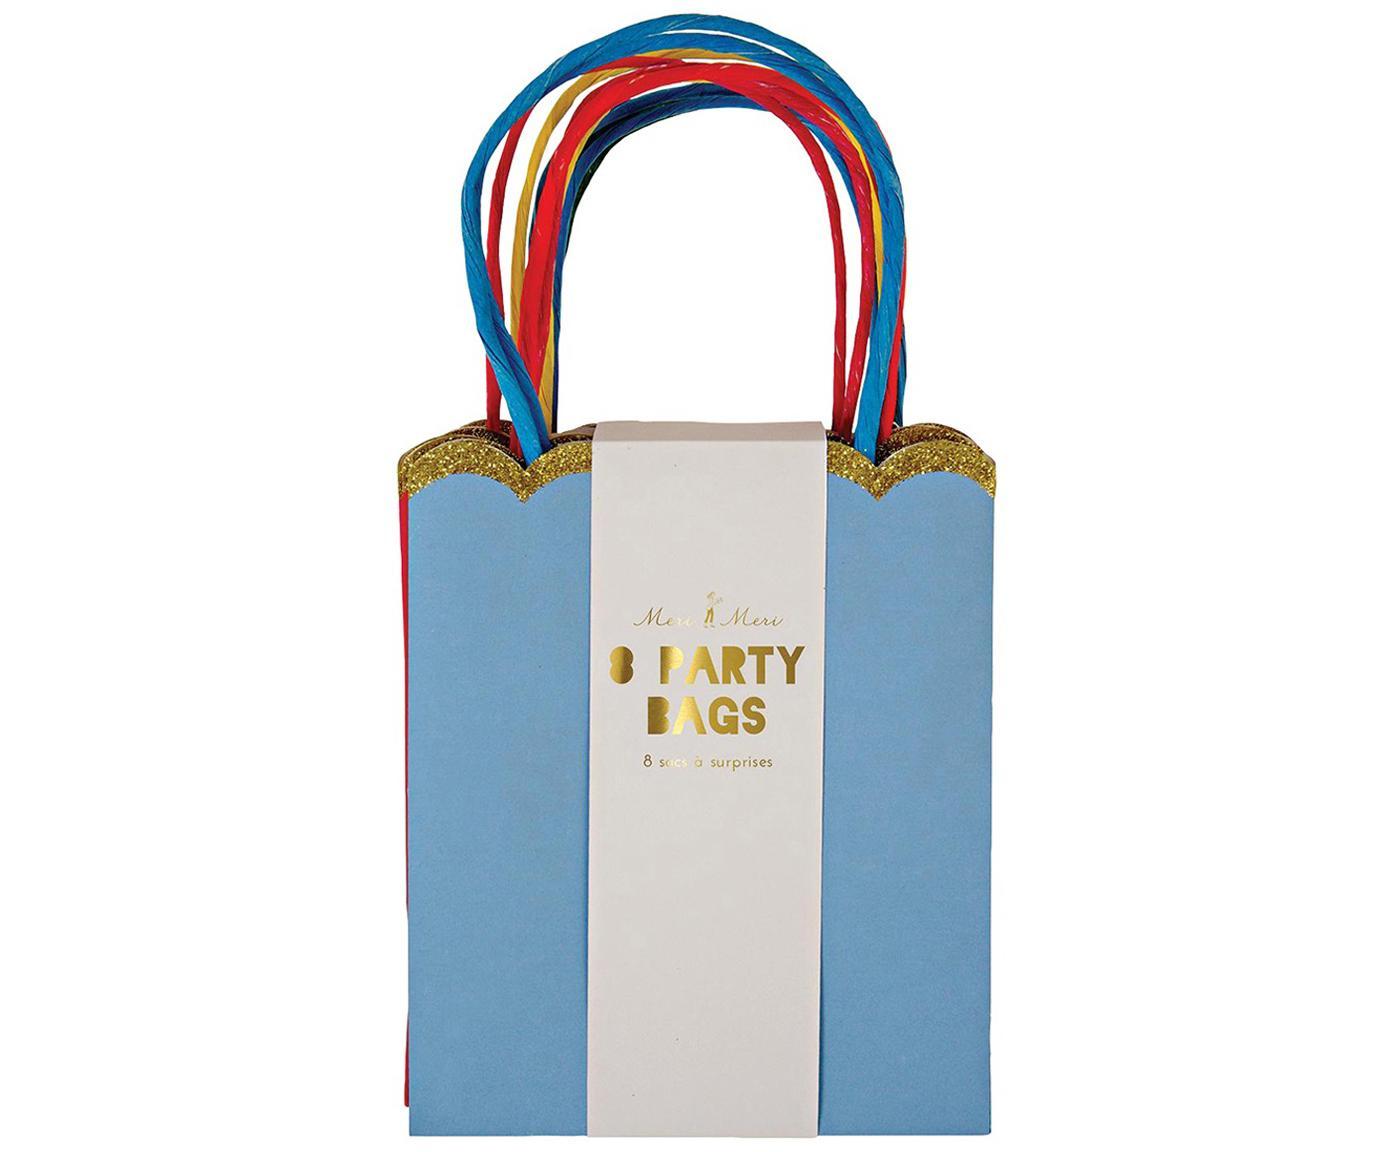 Busta regalo Jess, 8 pz., Carta, cartone, Multicolore, L 13 x A 23 cm